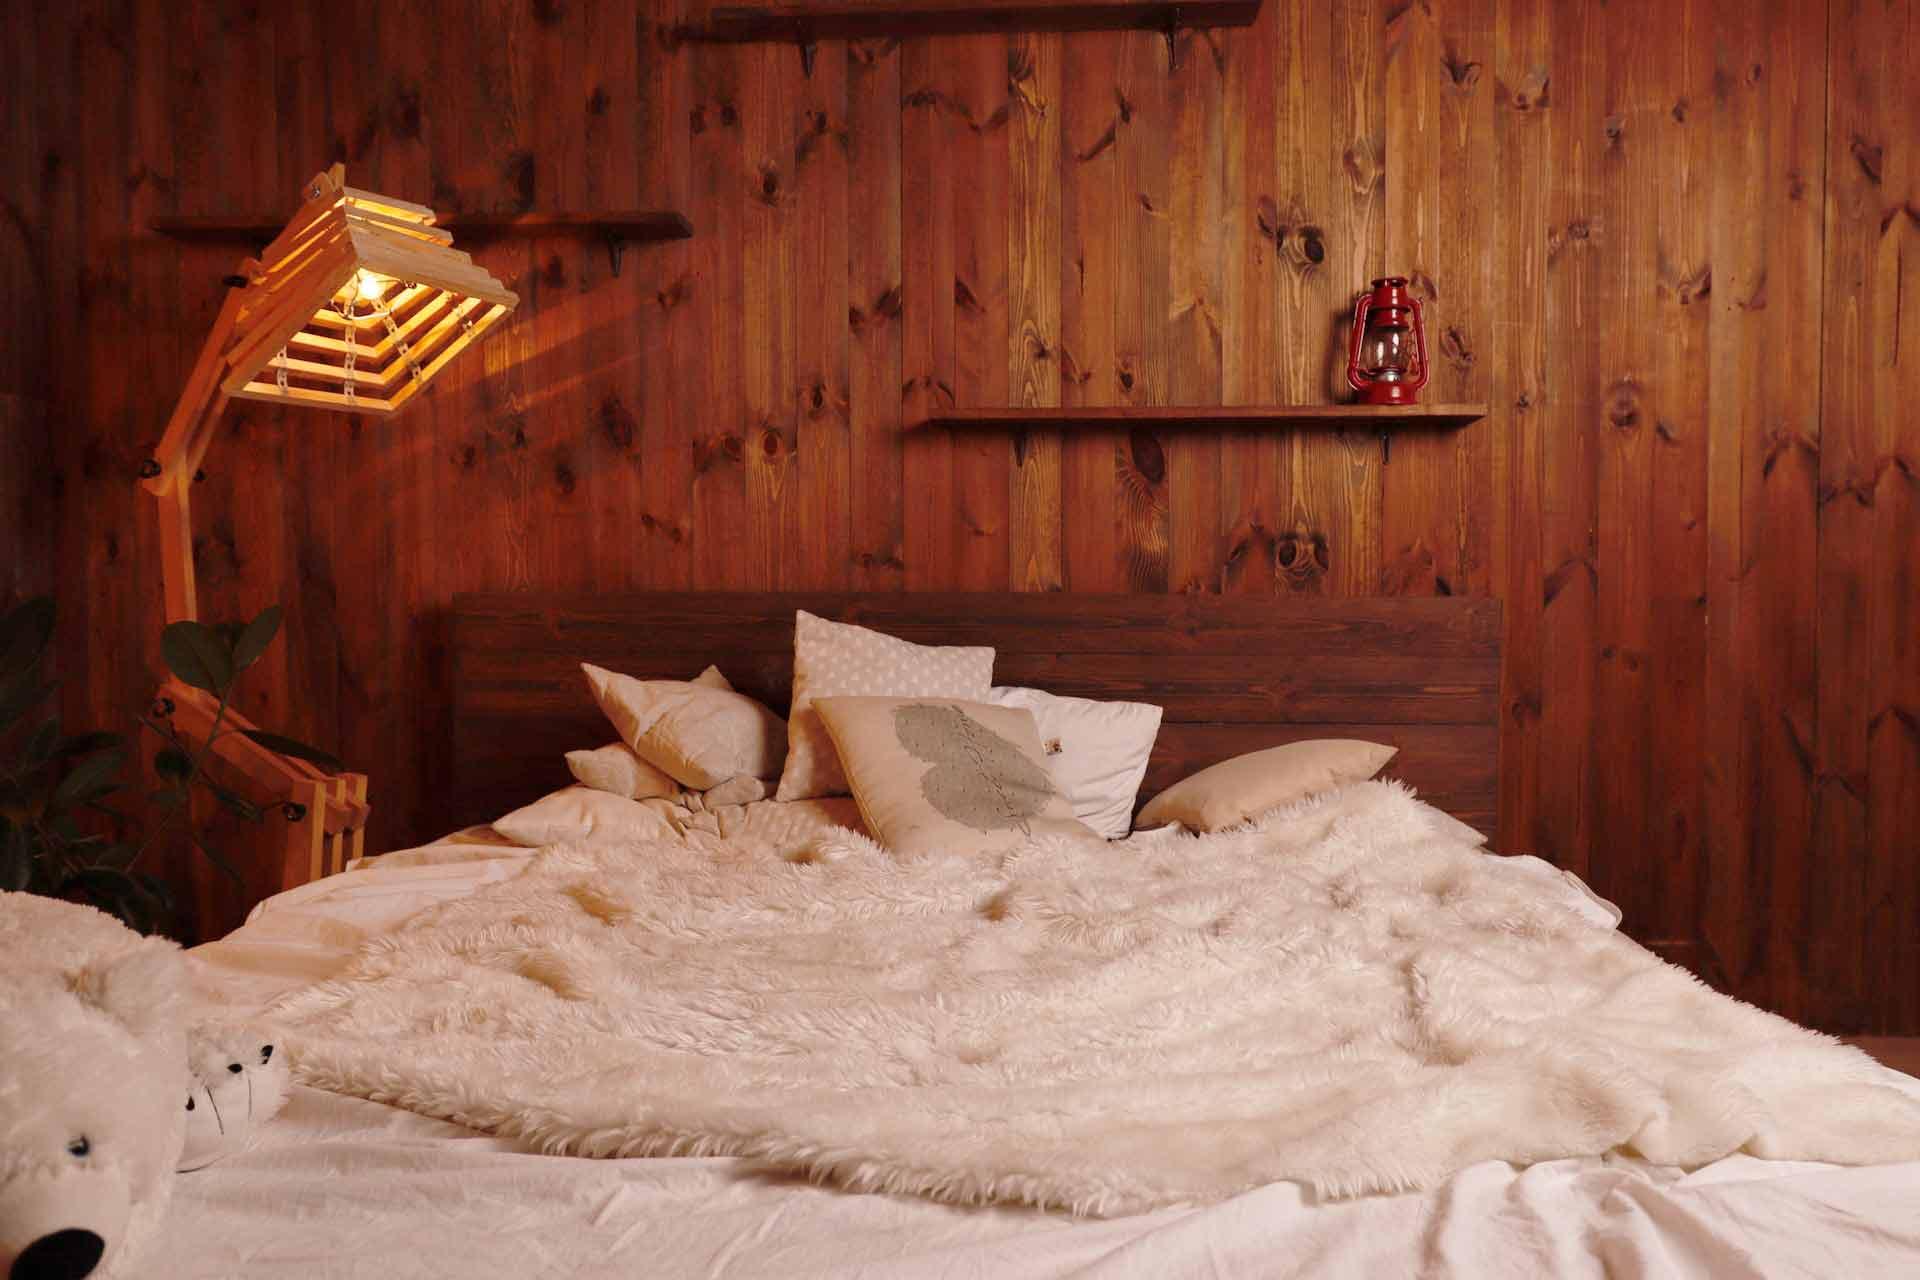 Dominasi kayu yang super maskulin dengan selimut bulu yang super nyaman, foto oleh Maksym Tymchhyk via unsplash.com